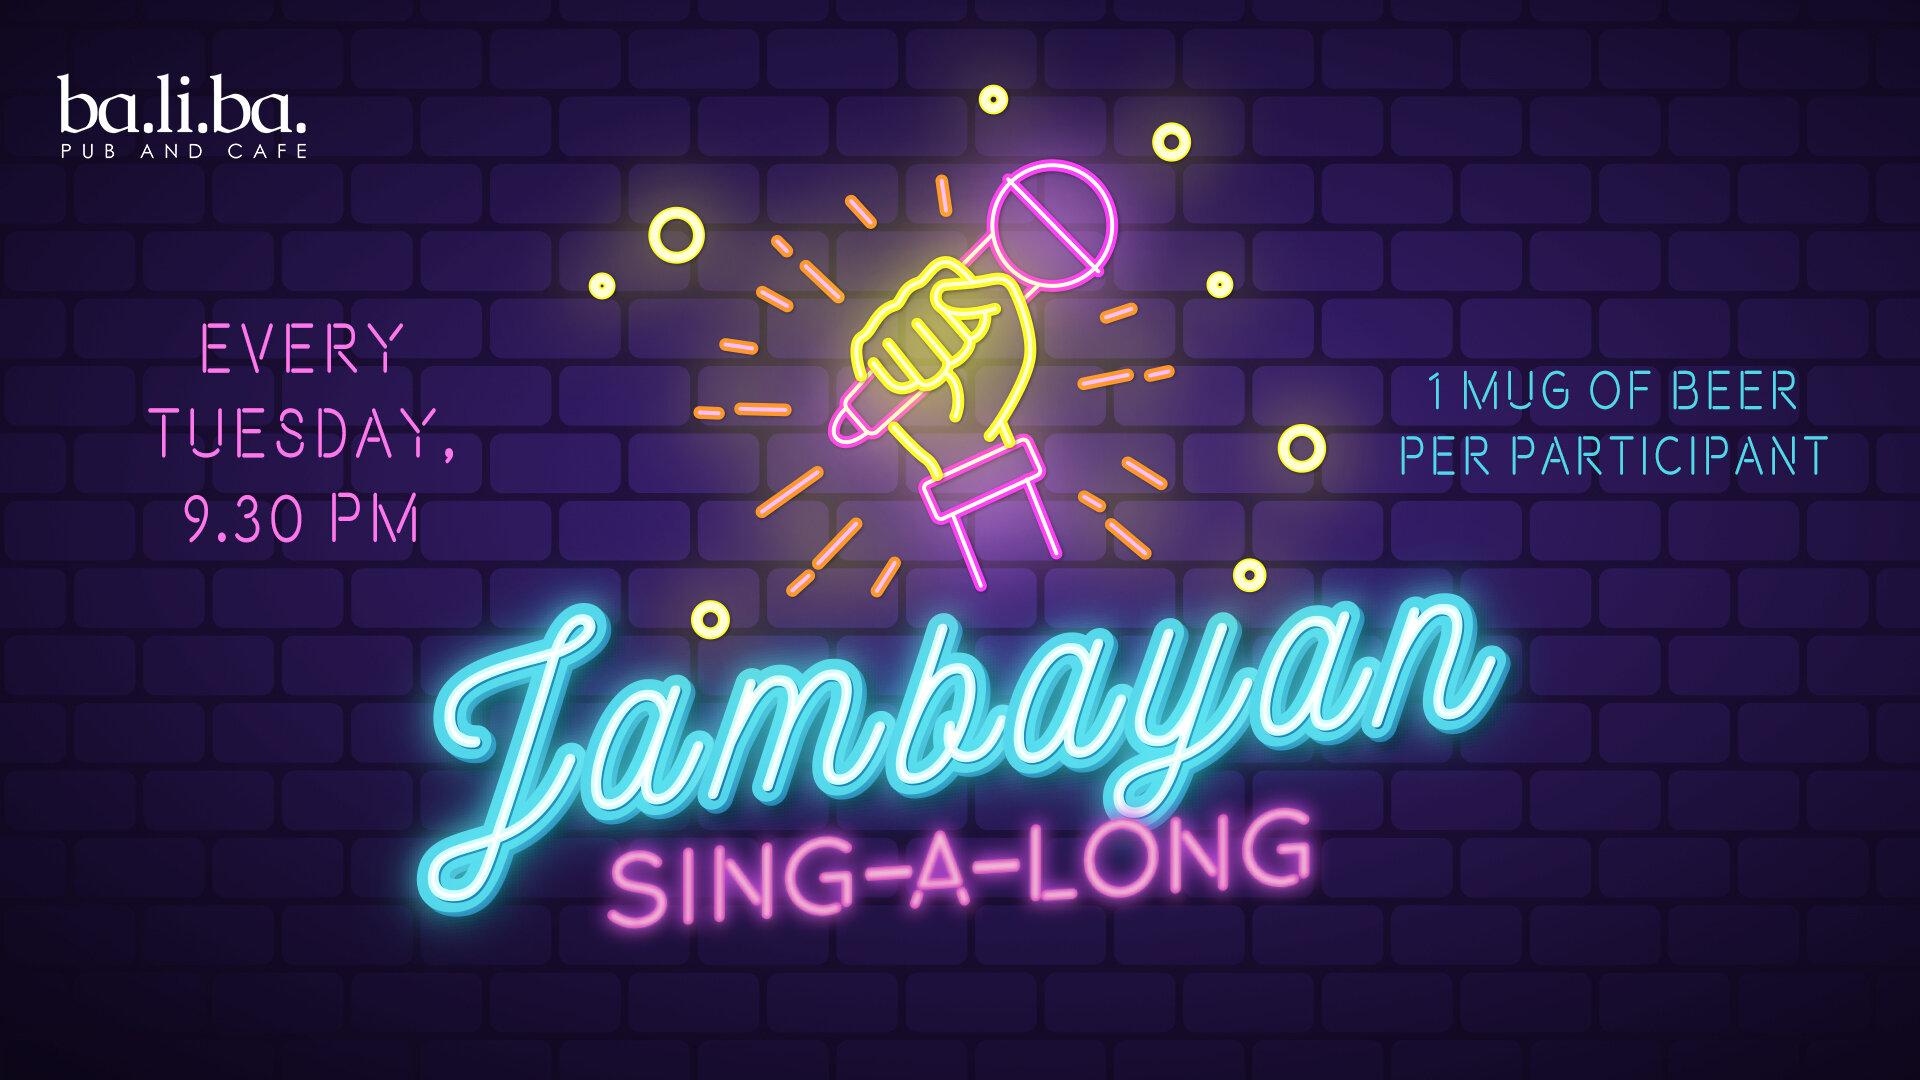 190910-TV-poster-1-Jambayan-sing-a-long-baliba-SH.jpg